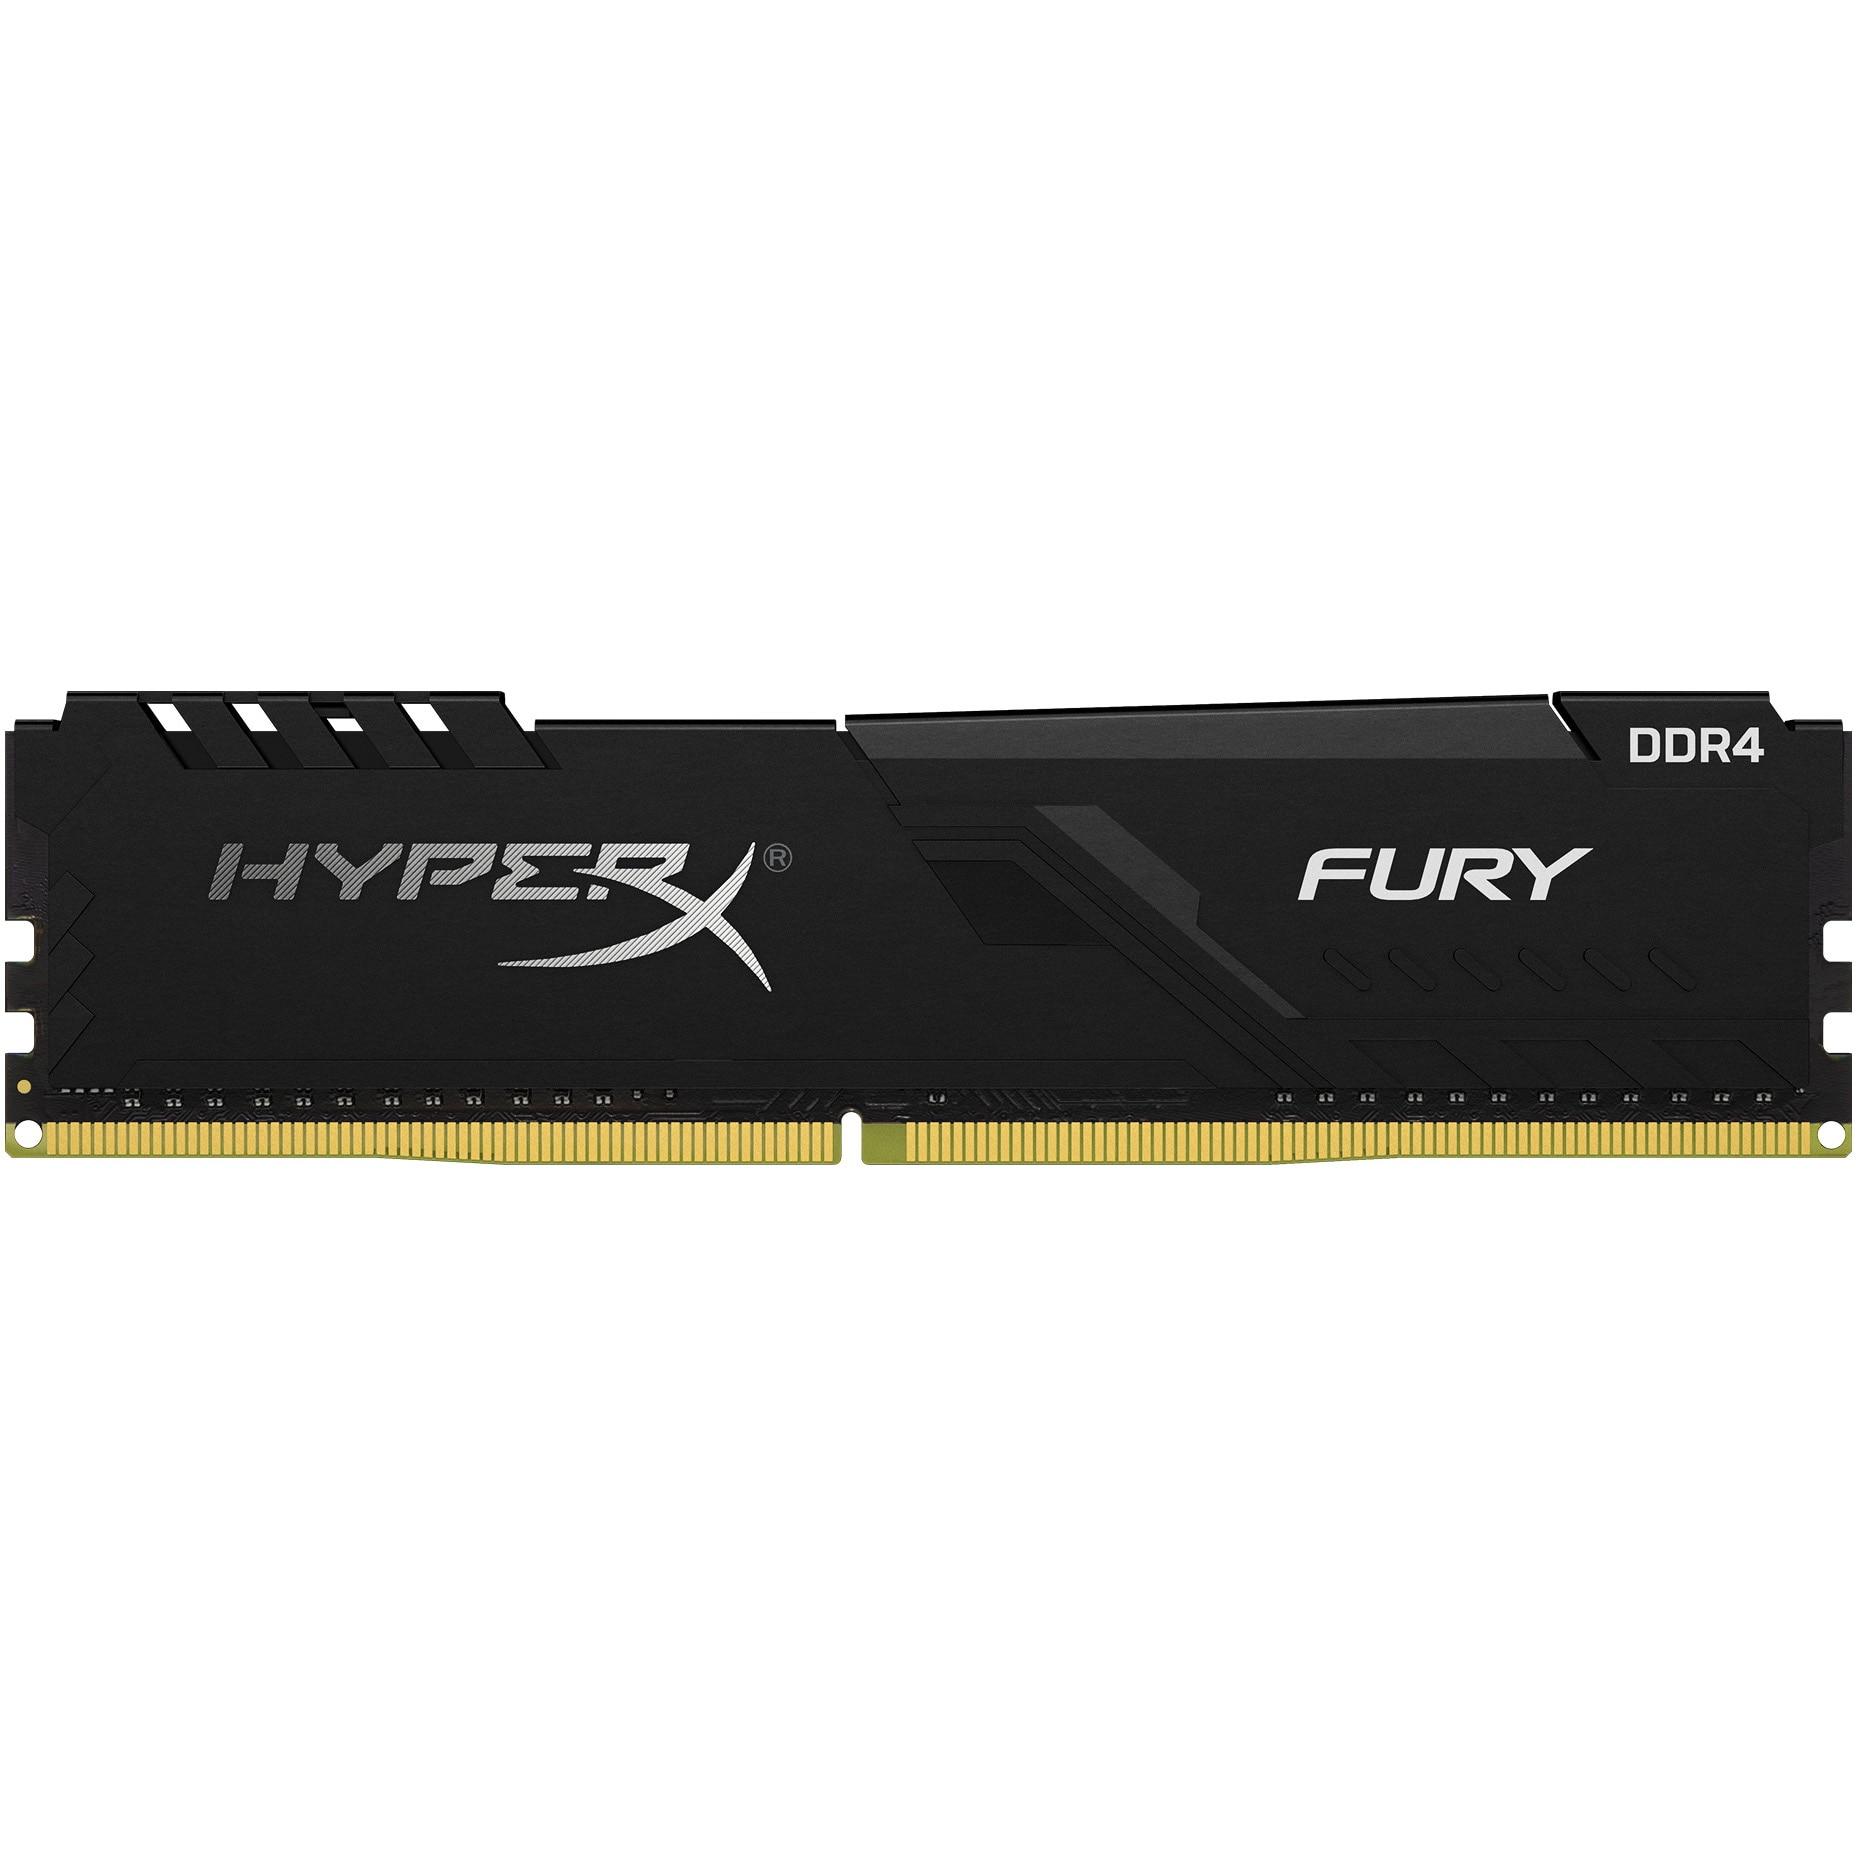 Fotografie Memorie HyperX Fury, 16GB DDR4, 3200MHz CL16